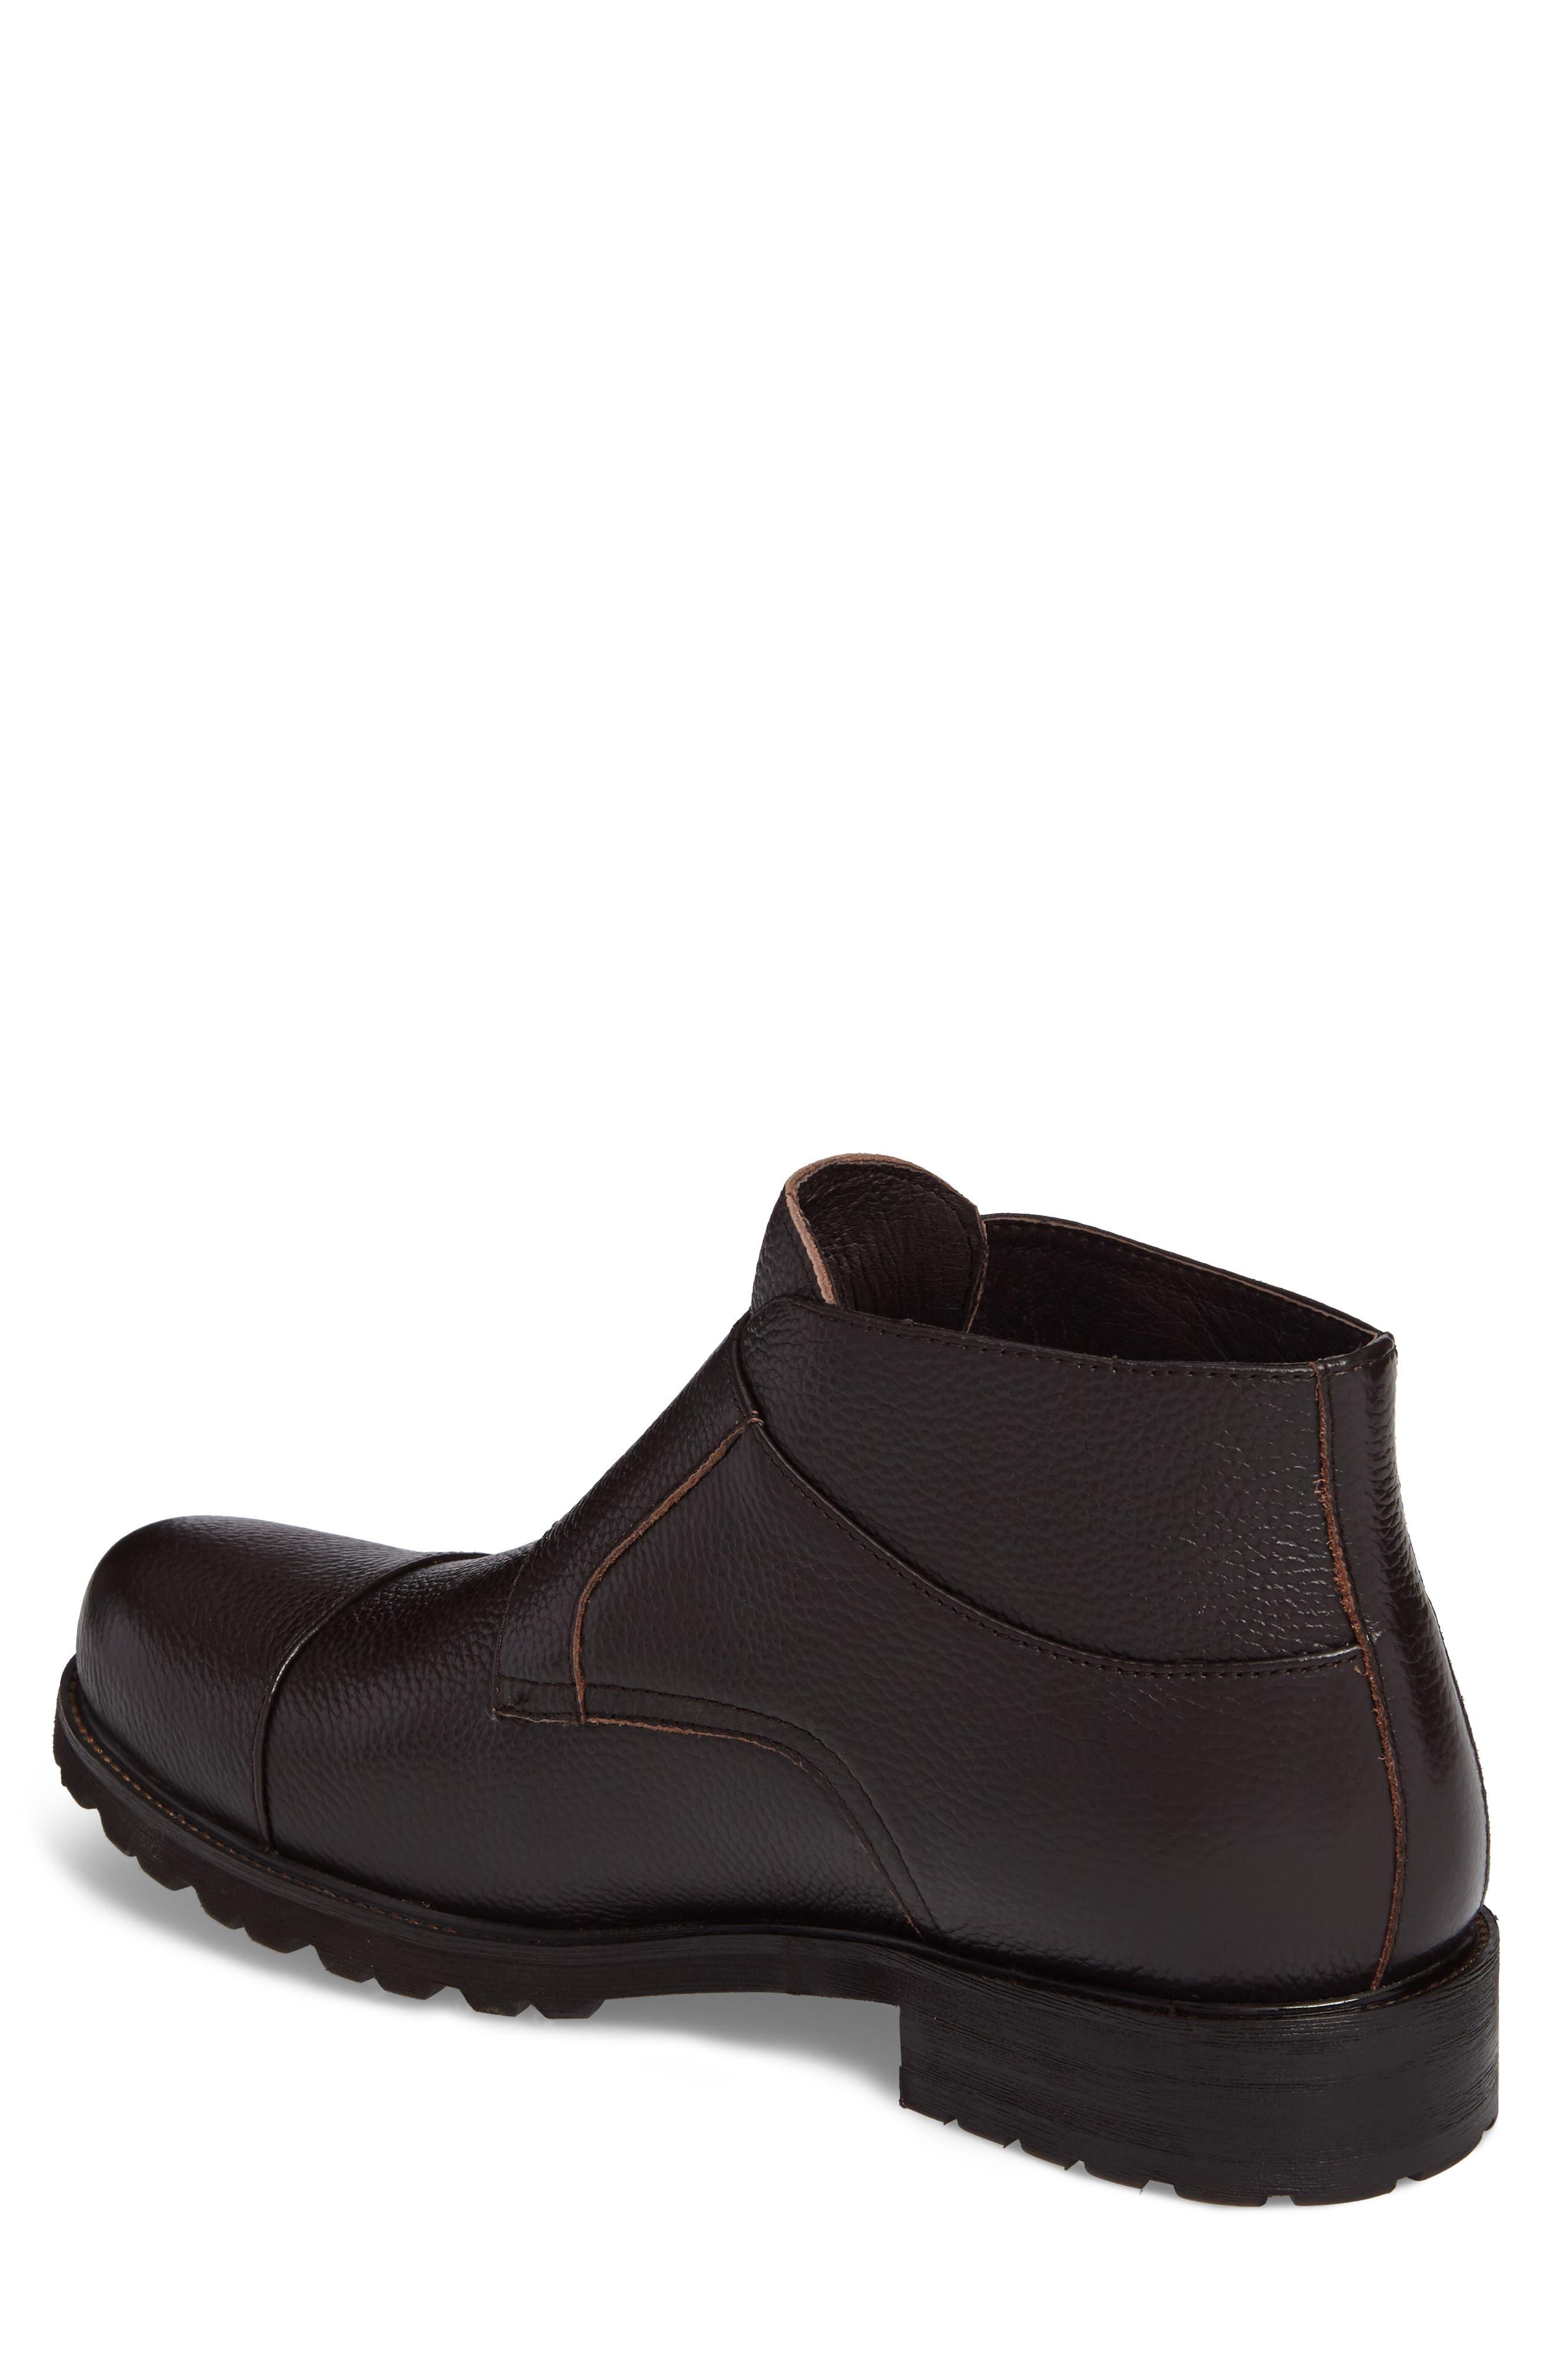 Koller Cap Toe Double Monk Boot,                             Alternate thumbnail 2, color,                             001